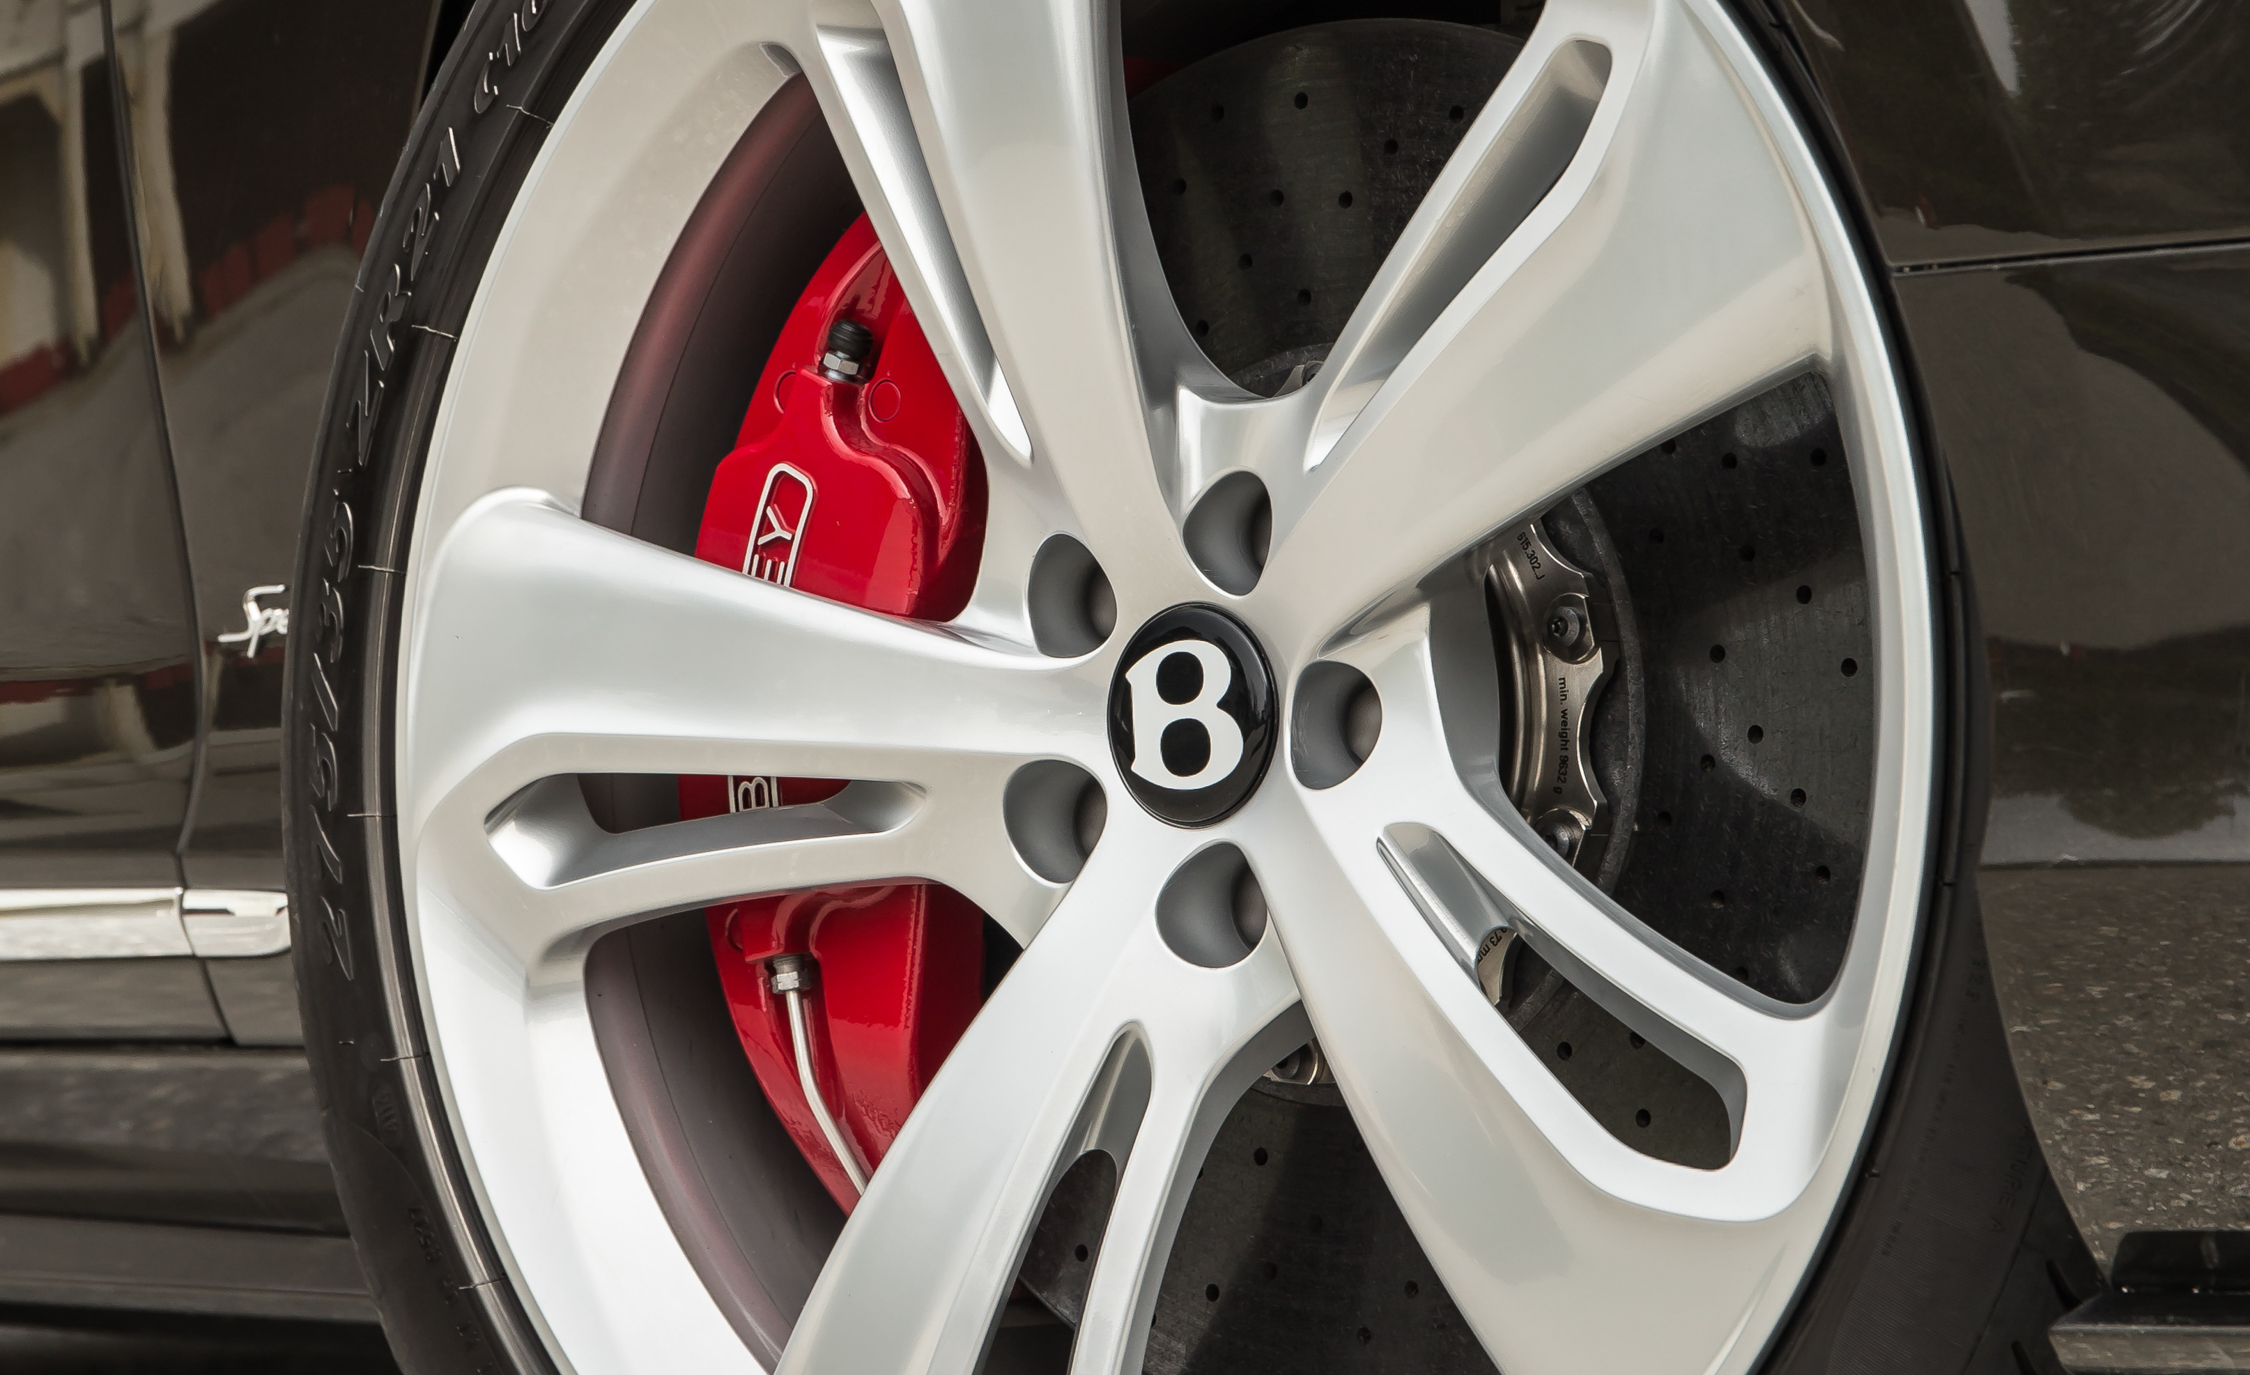 2016 Bentley Continental GT Speed Exterior Wheel Trim